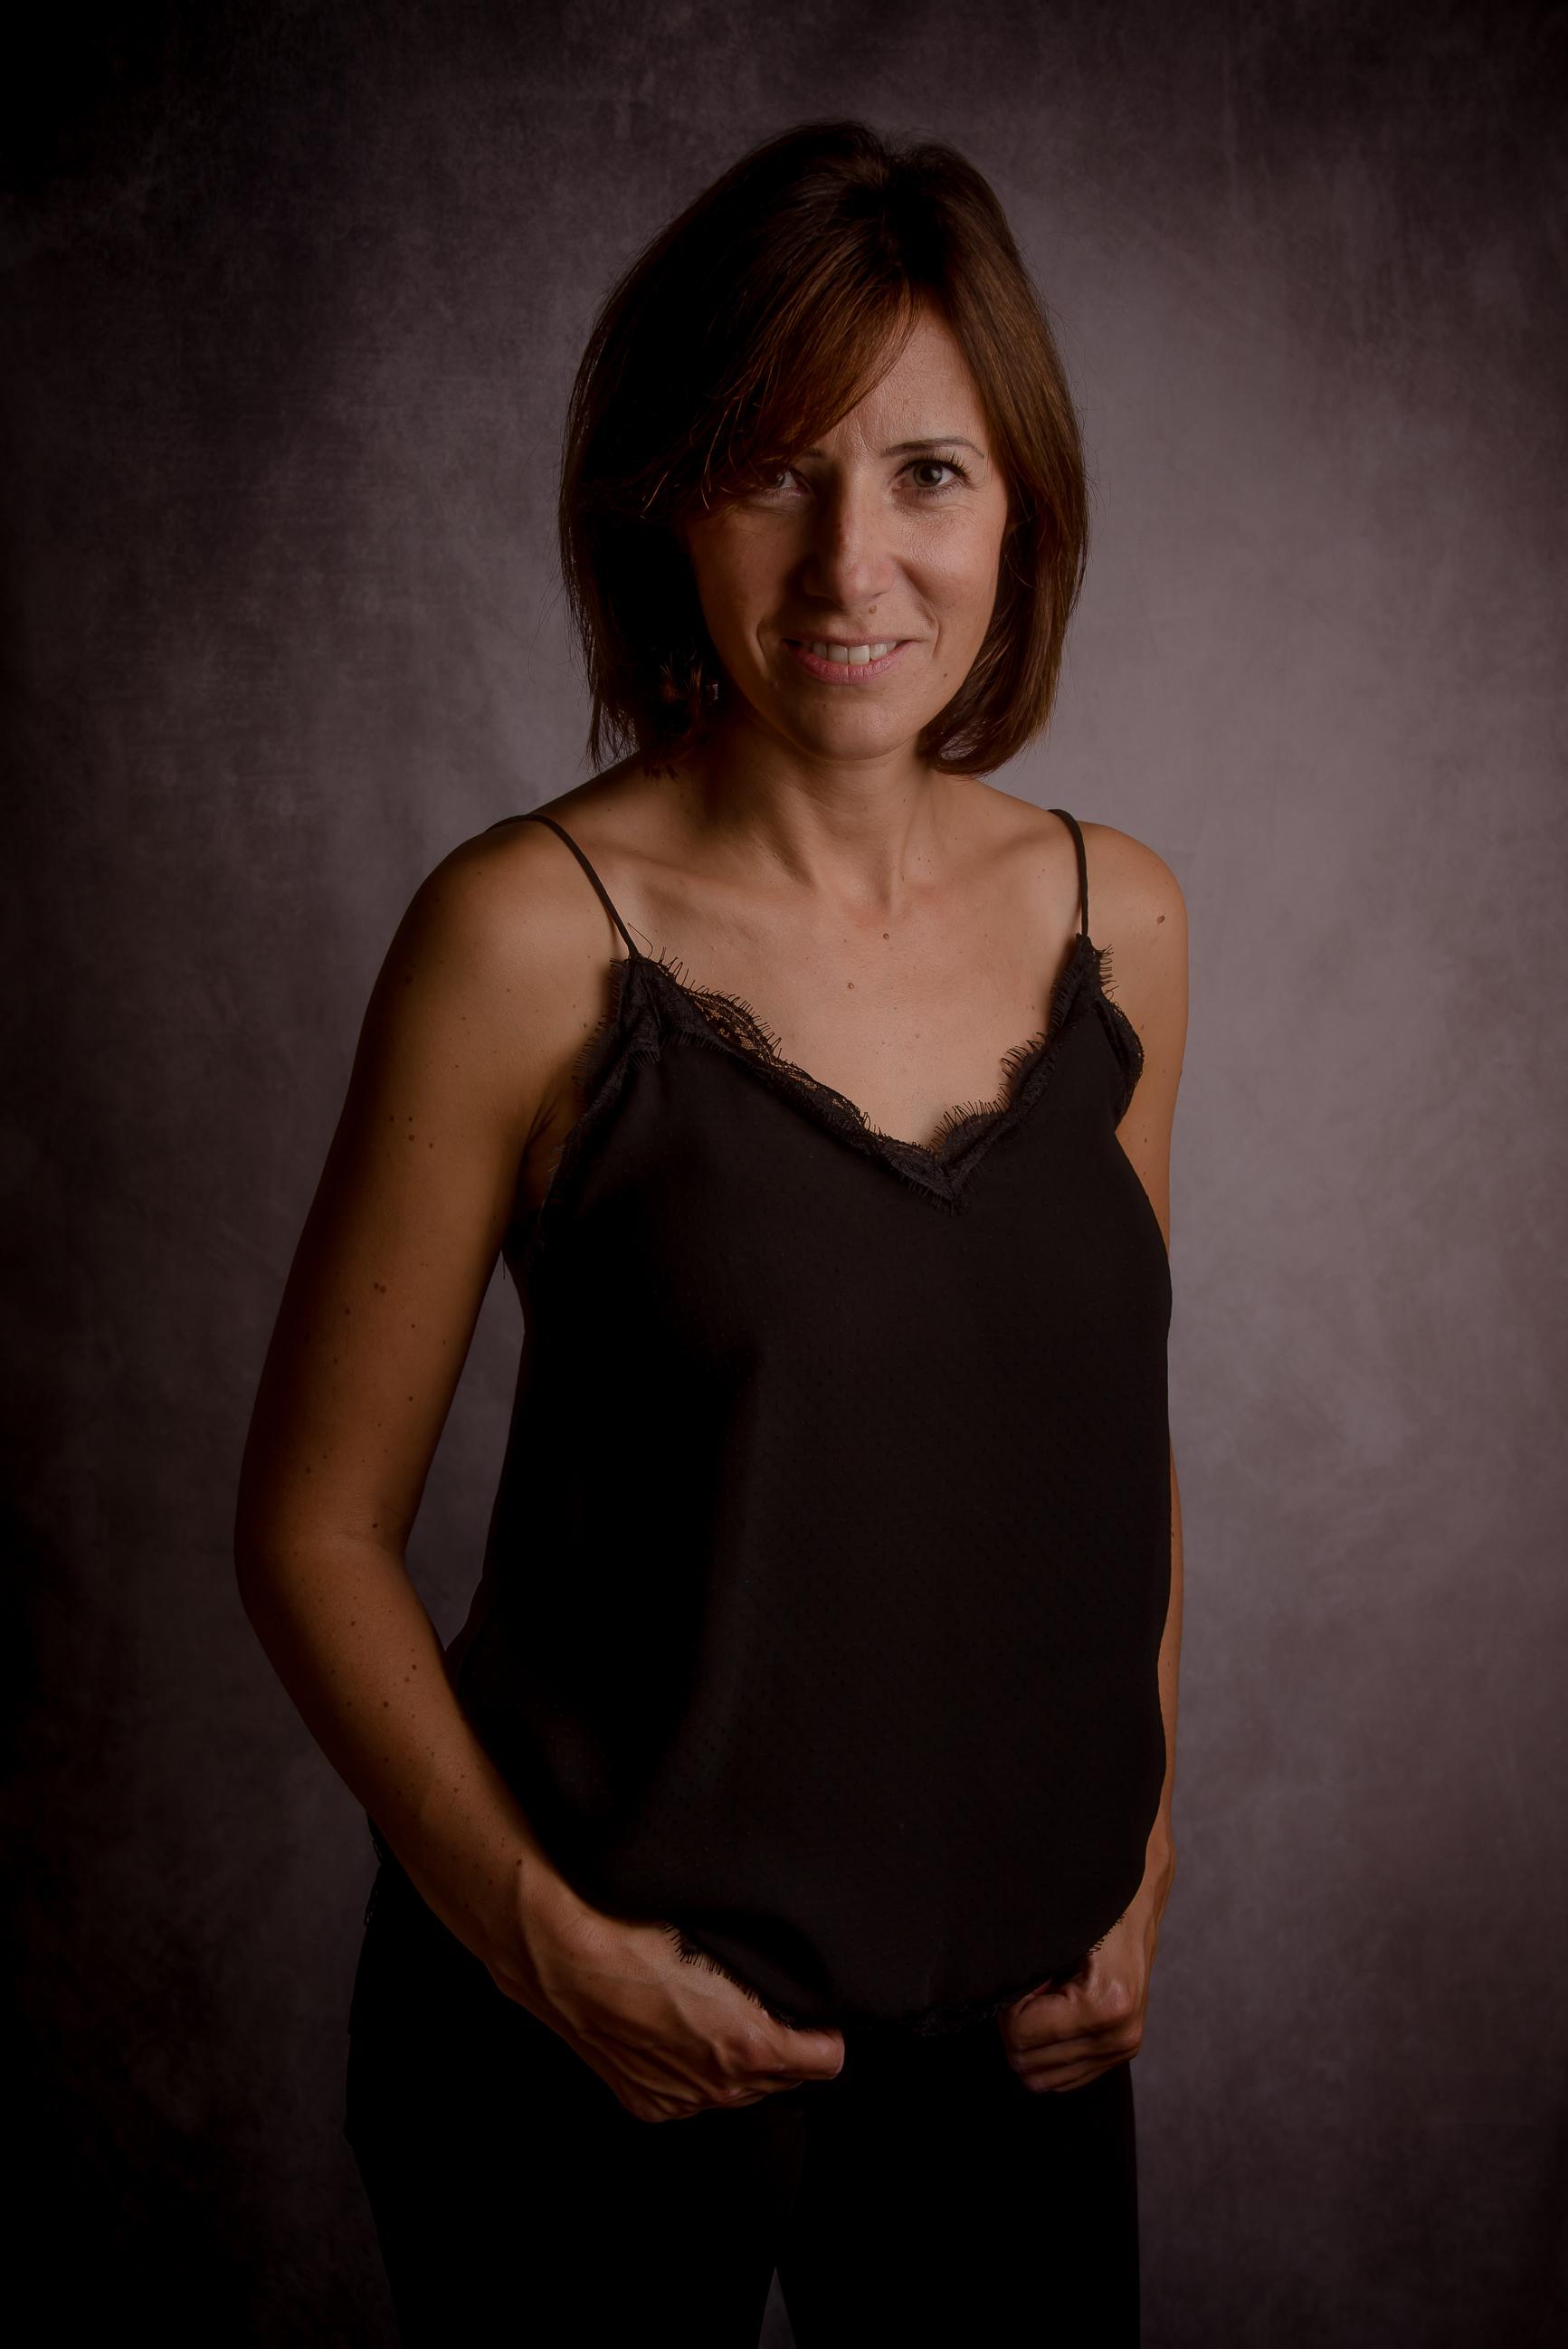 portrait femme brune